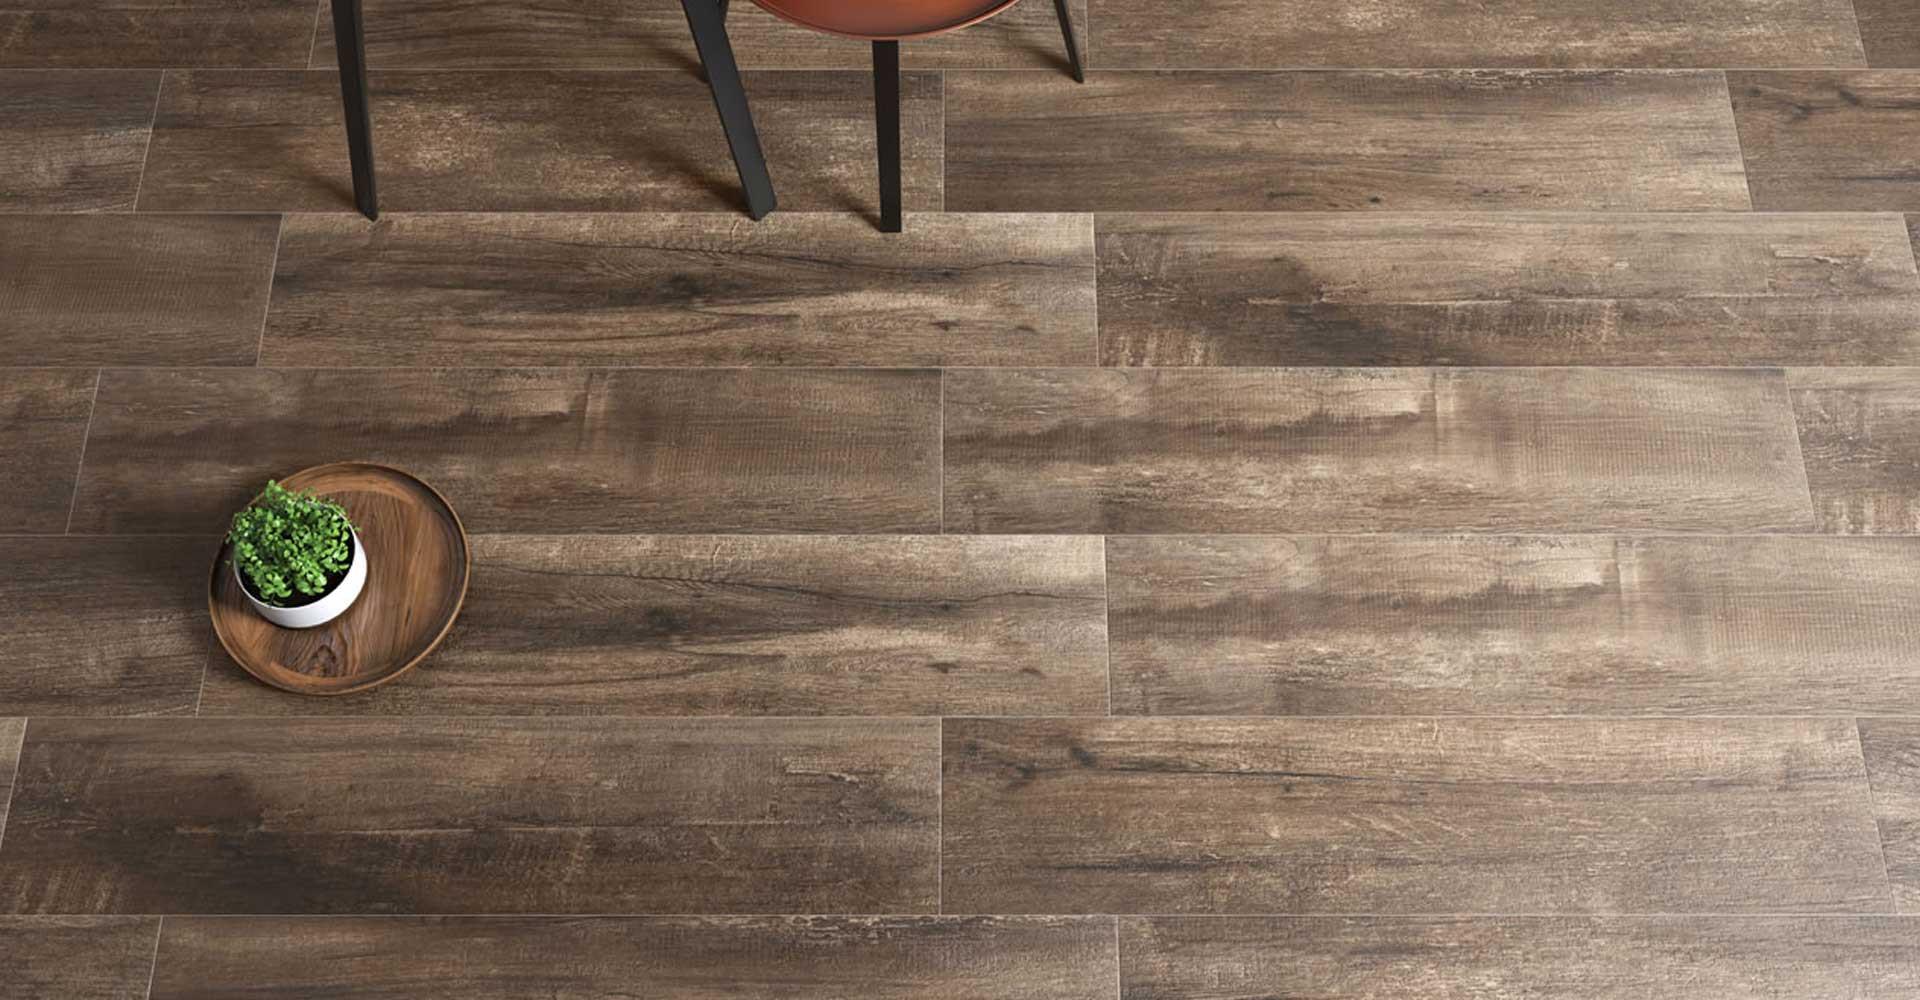 hardwood floor store bolingbrook il of american tile stone regarding atshome004